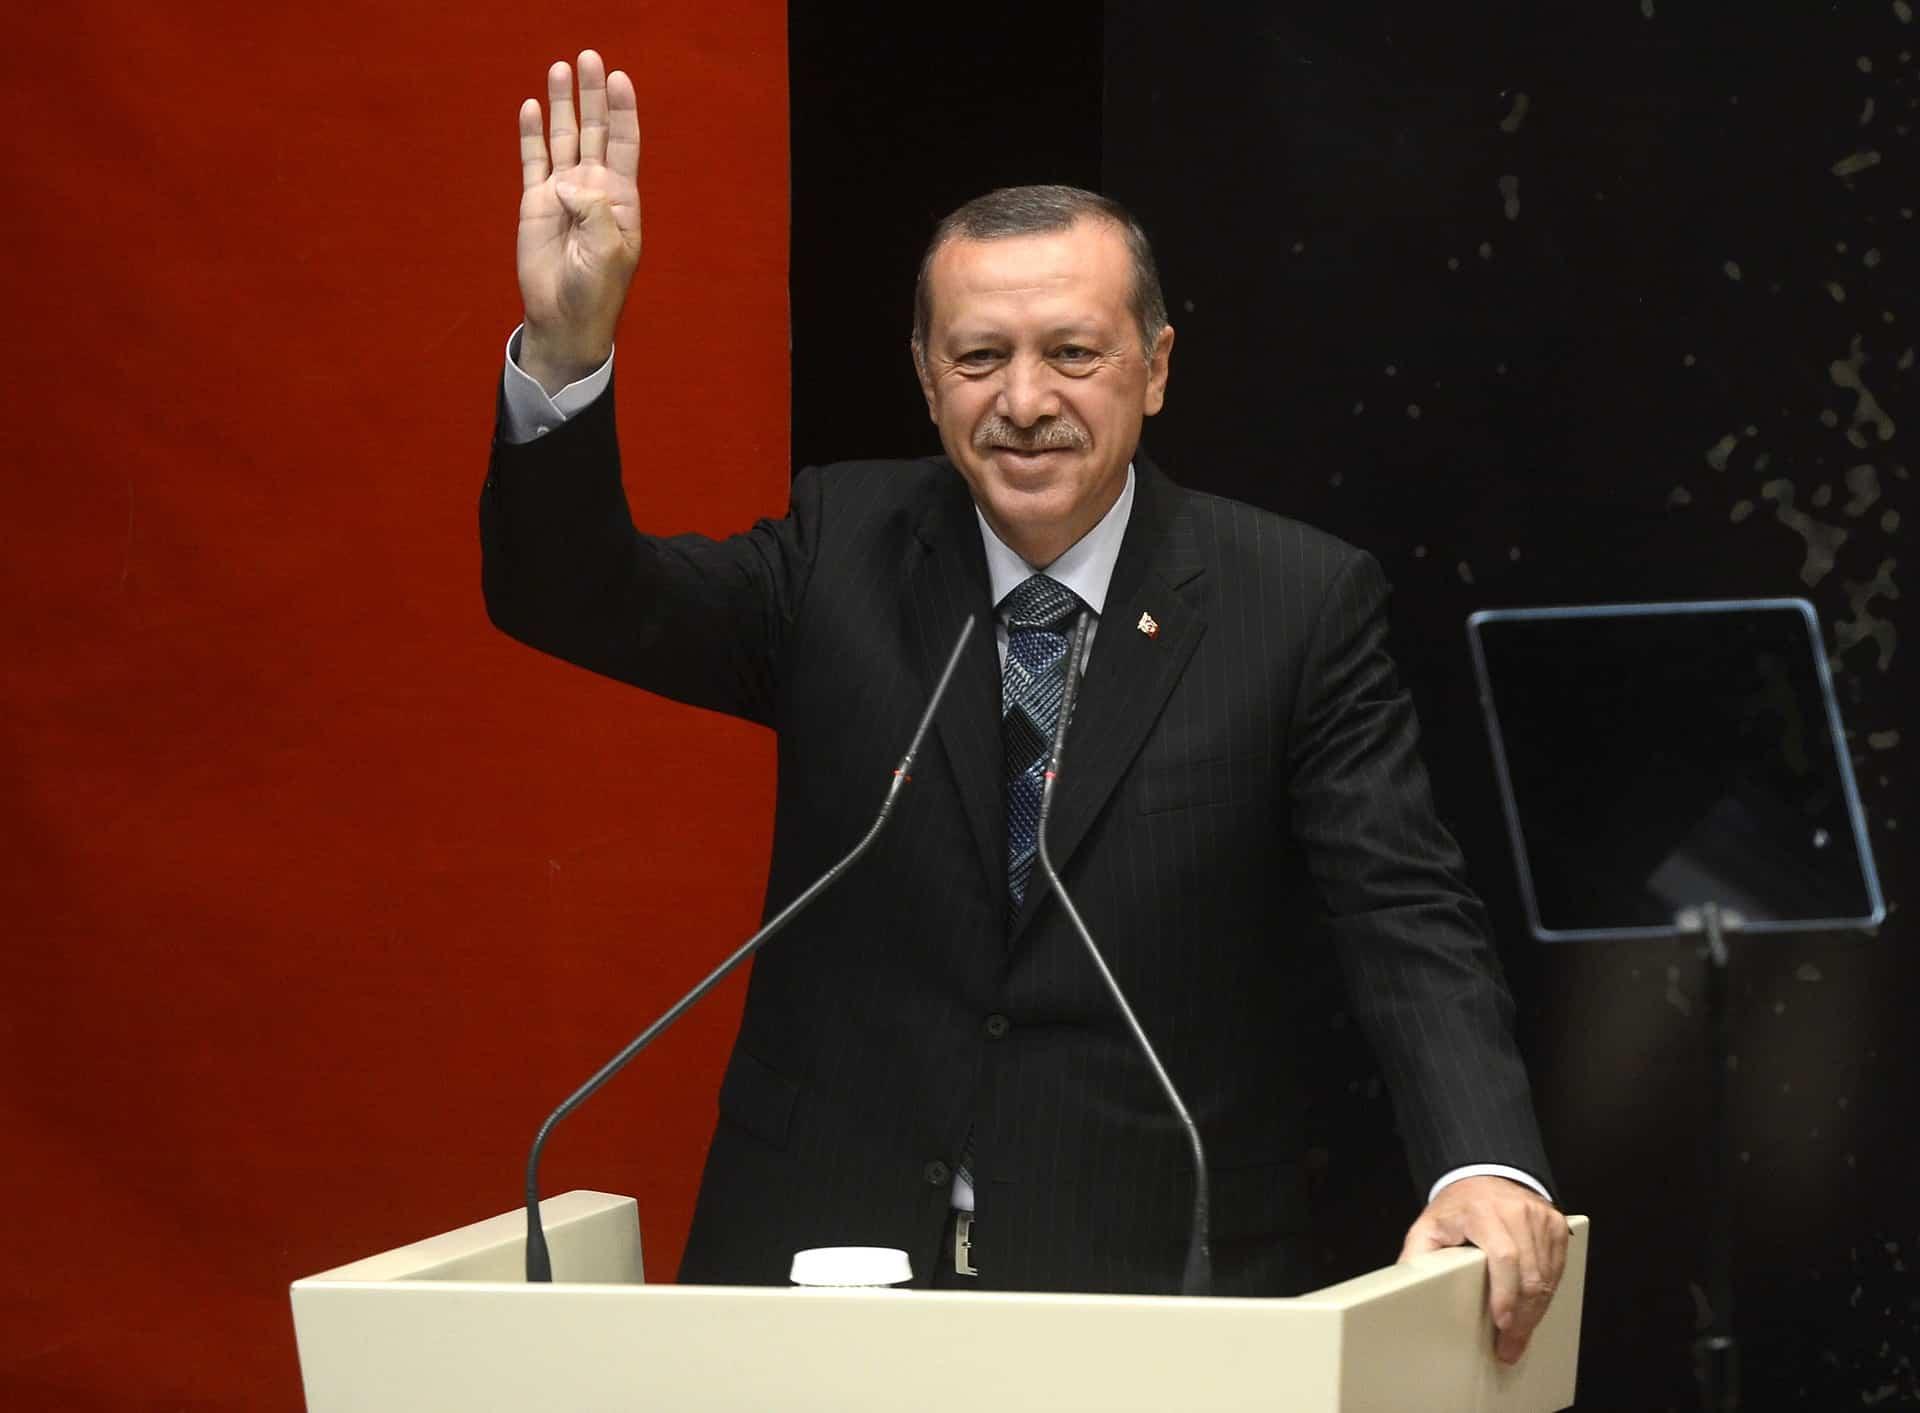 Is Turkey A Bad Actor In Regard To ISIS Prisoners Being Held In SDF Territory?